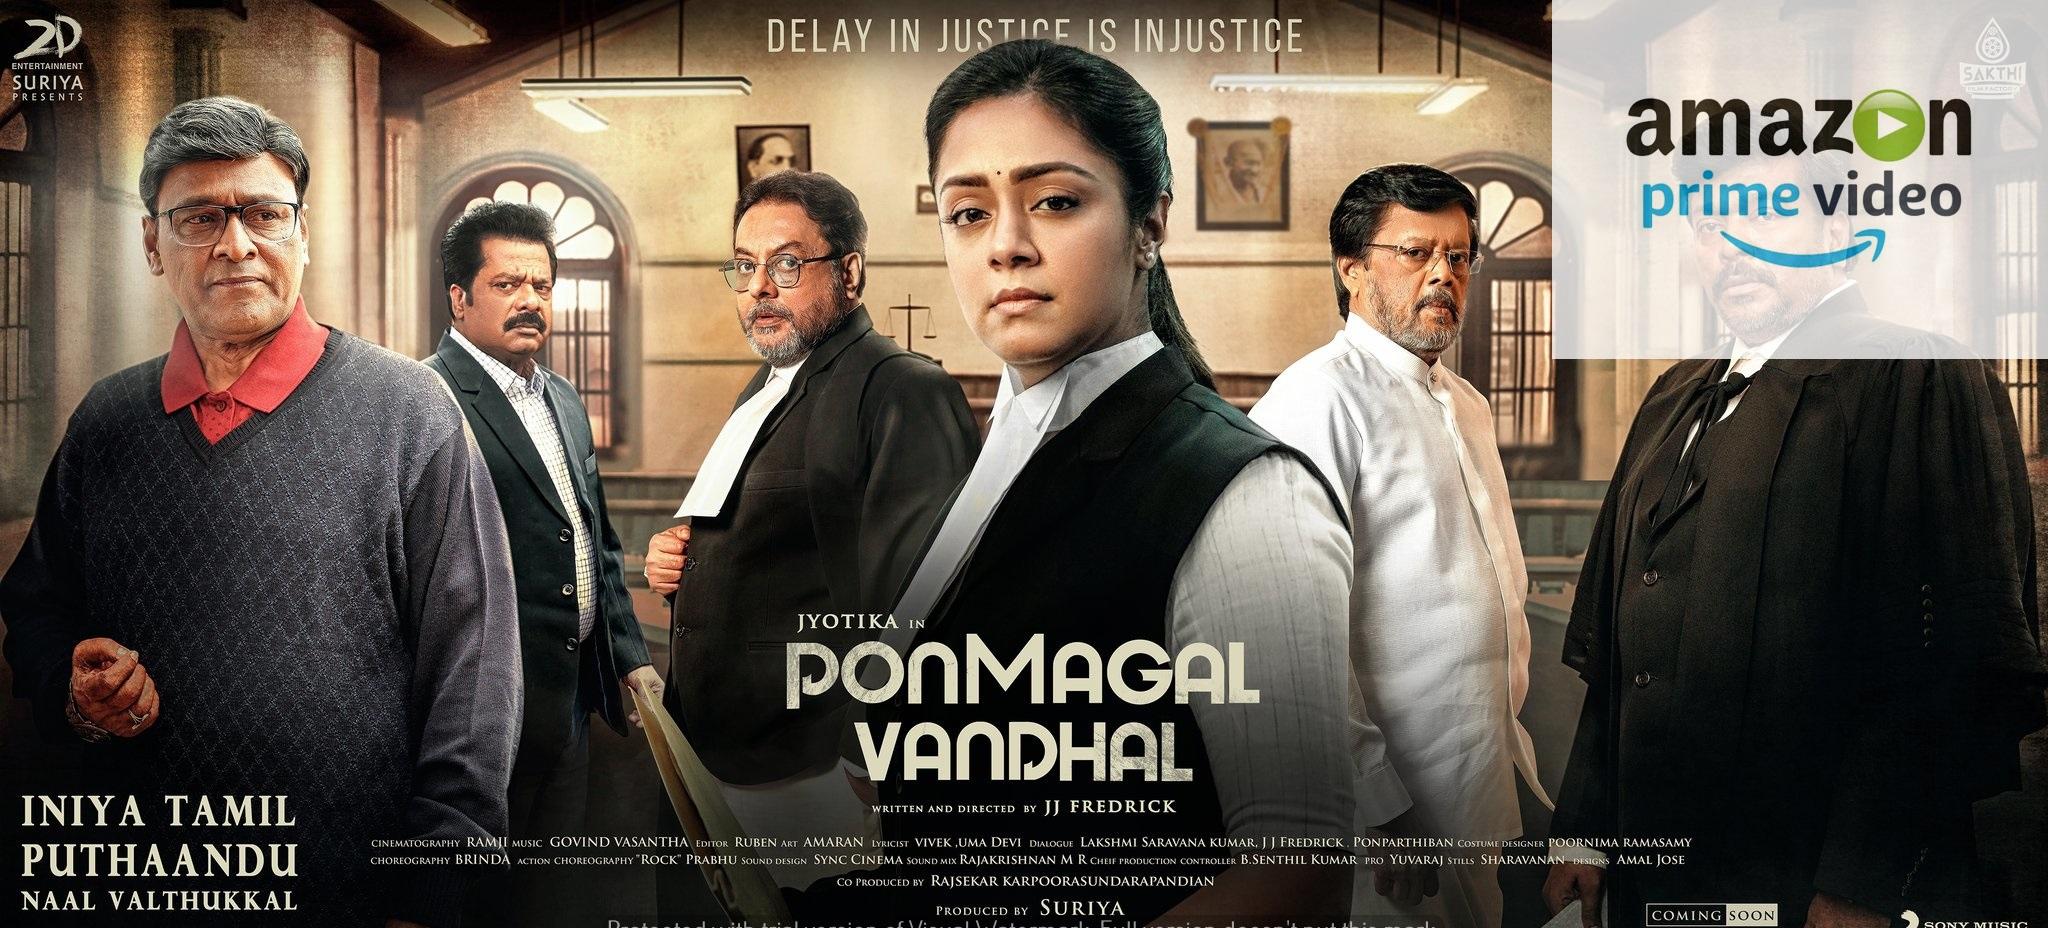 Ponmagal Vanthal Movie Amazon Prime